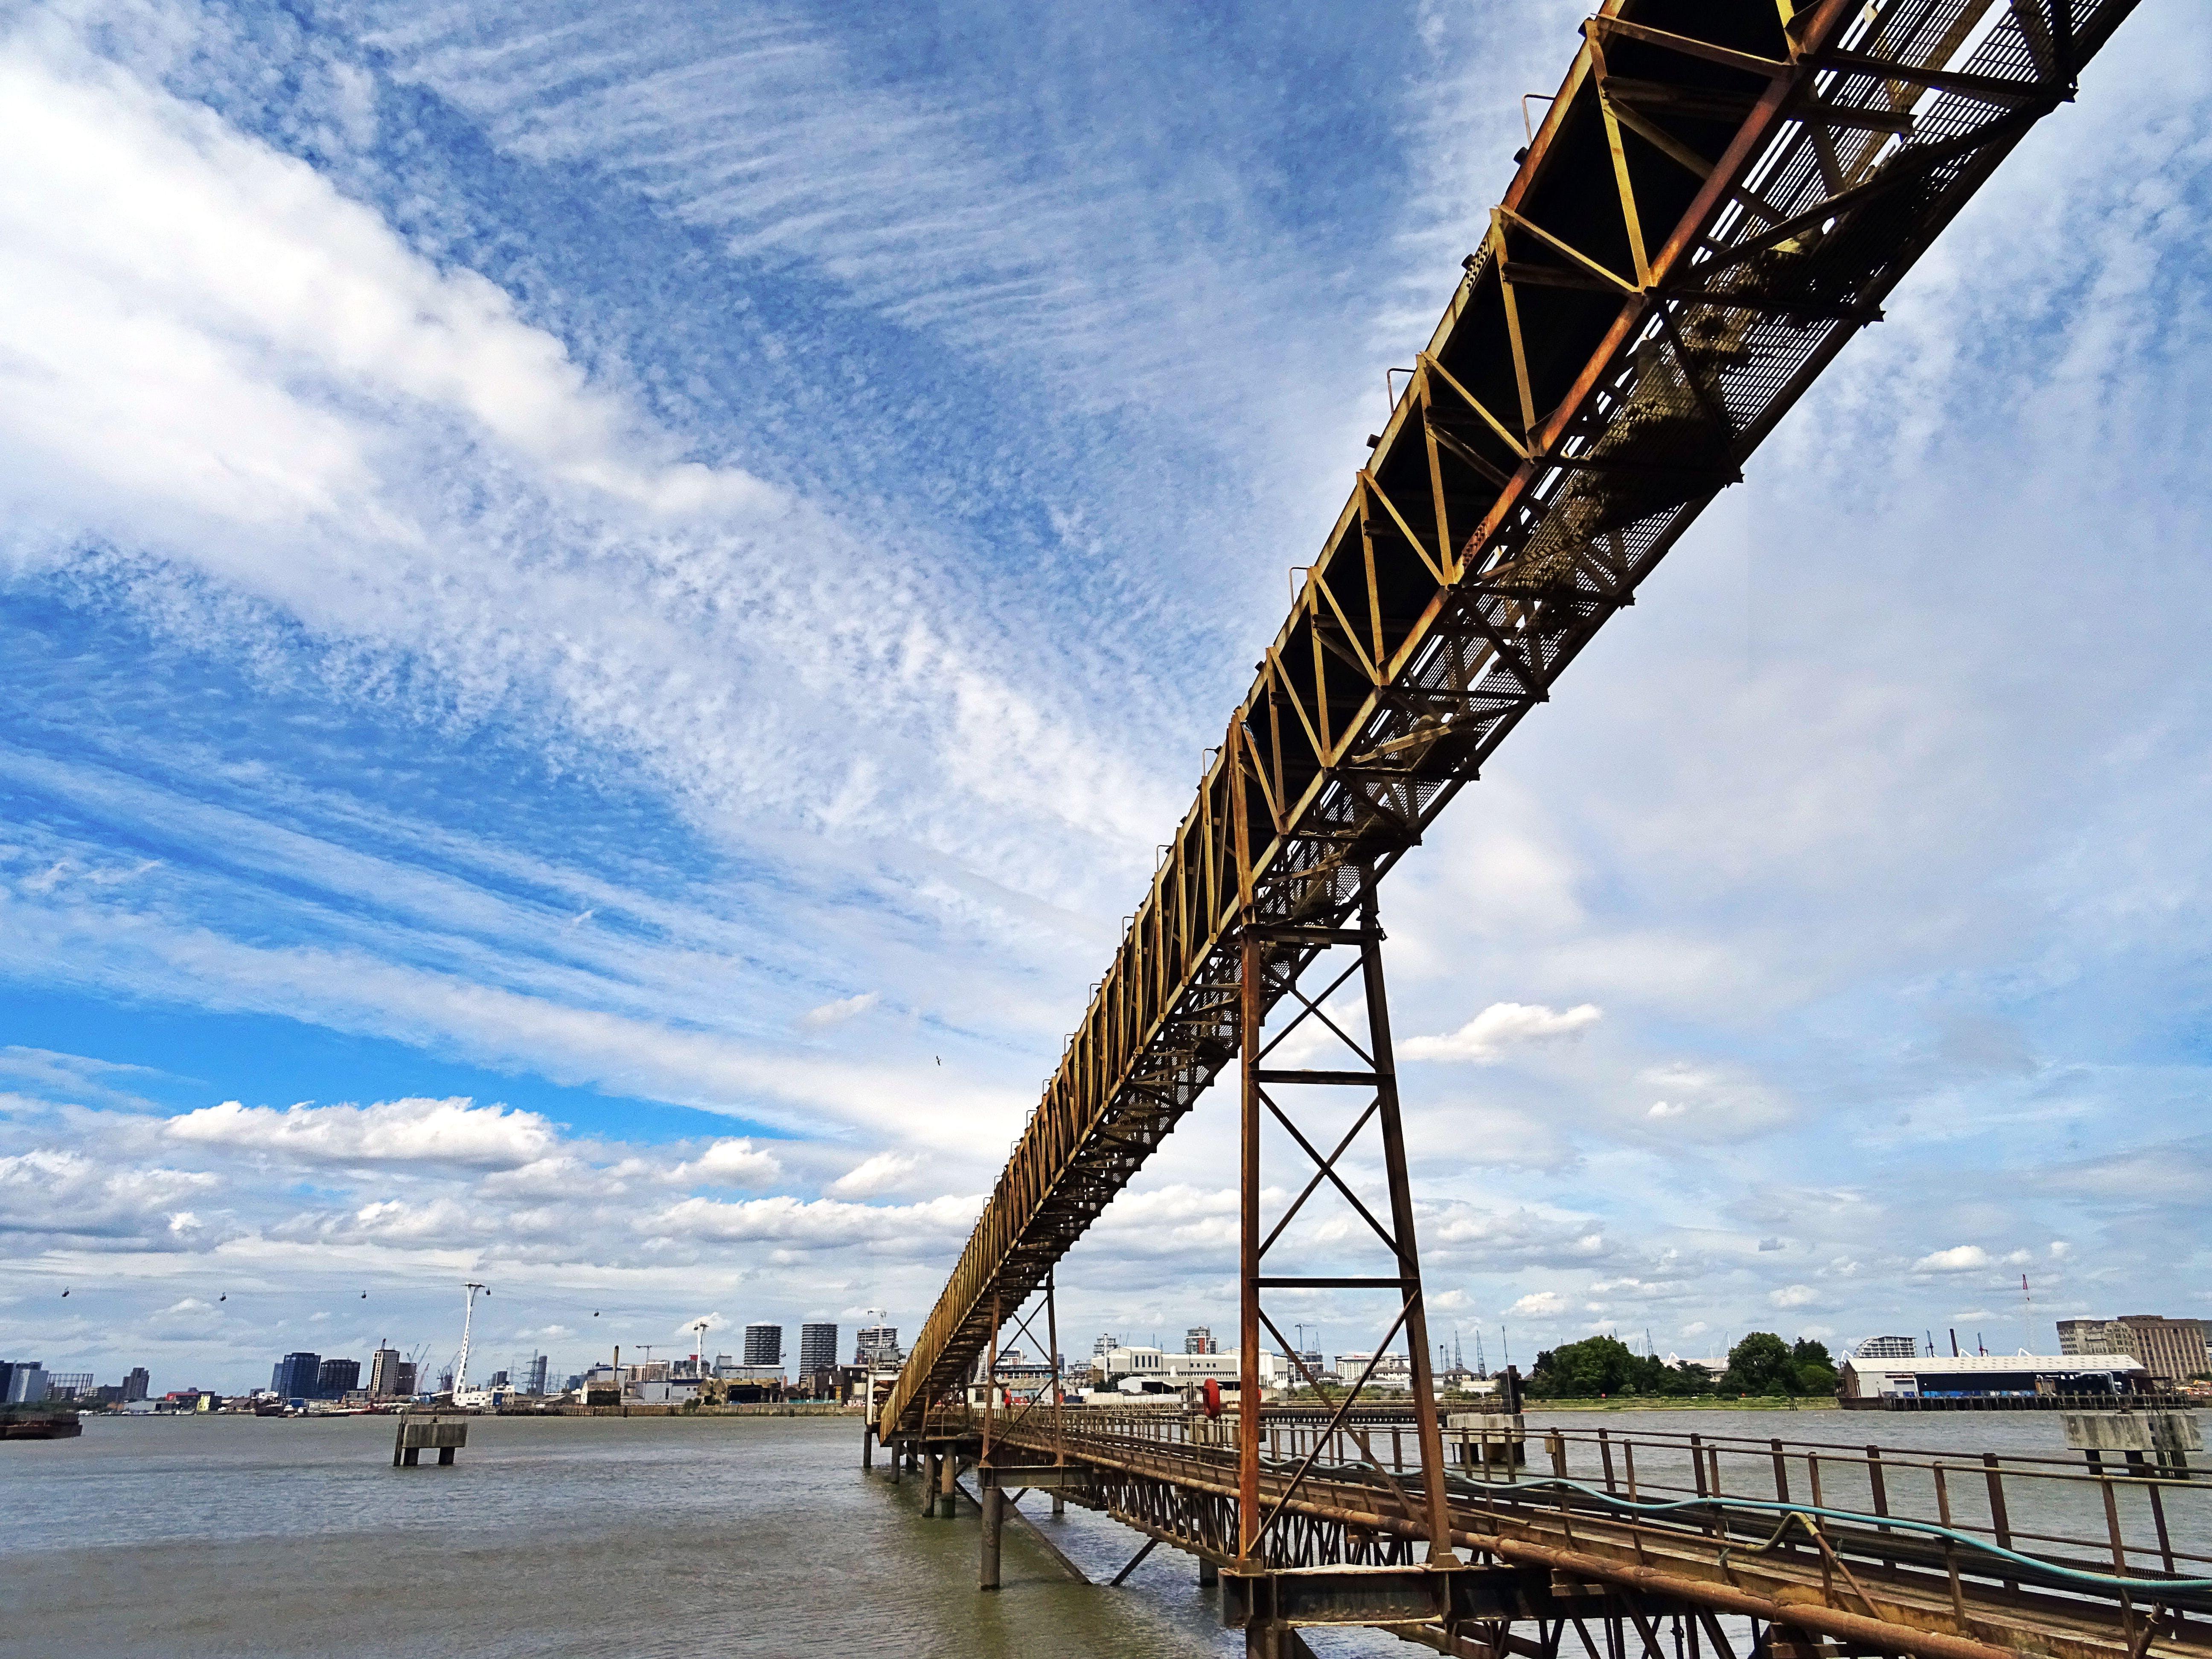 Brown Steel Bridge Under Cloudy Sky